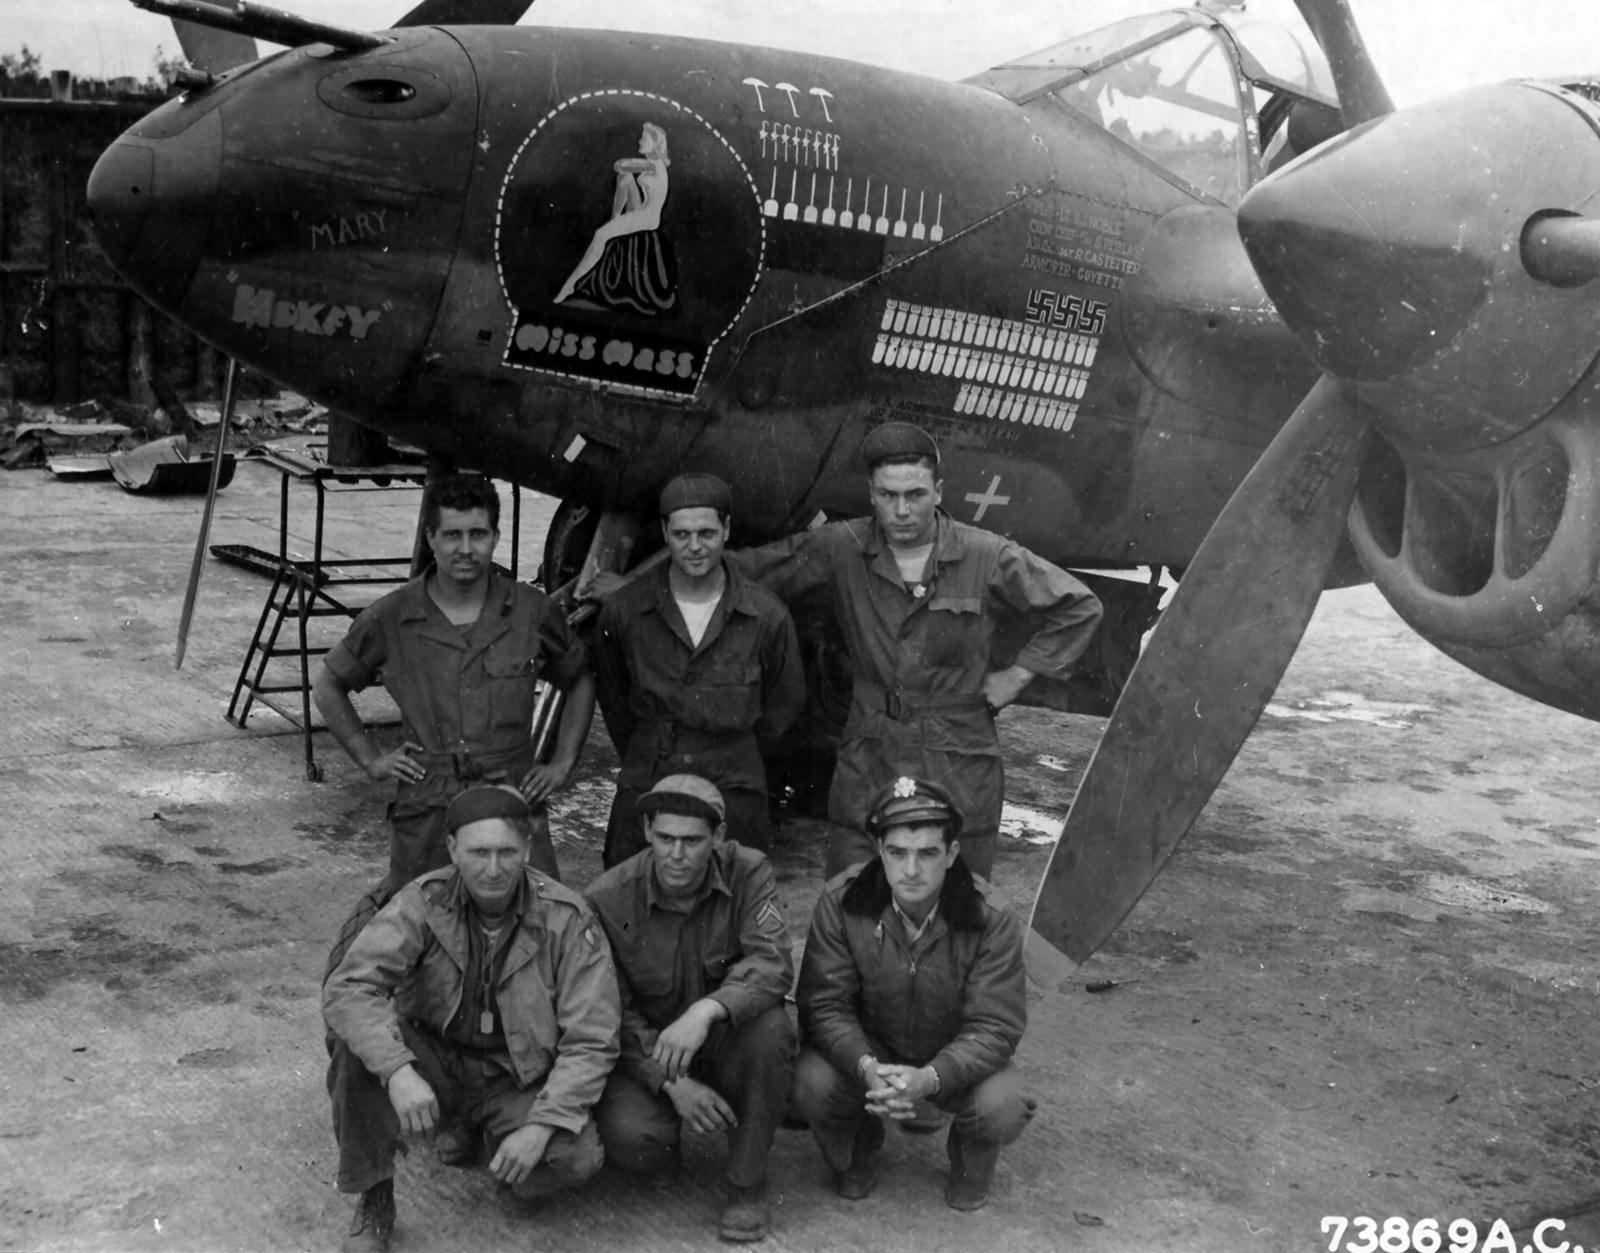 P-38-J-Lightning-serial-42-67449-Miss-Ma